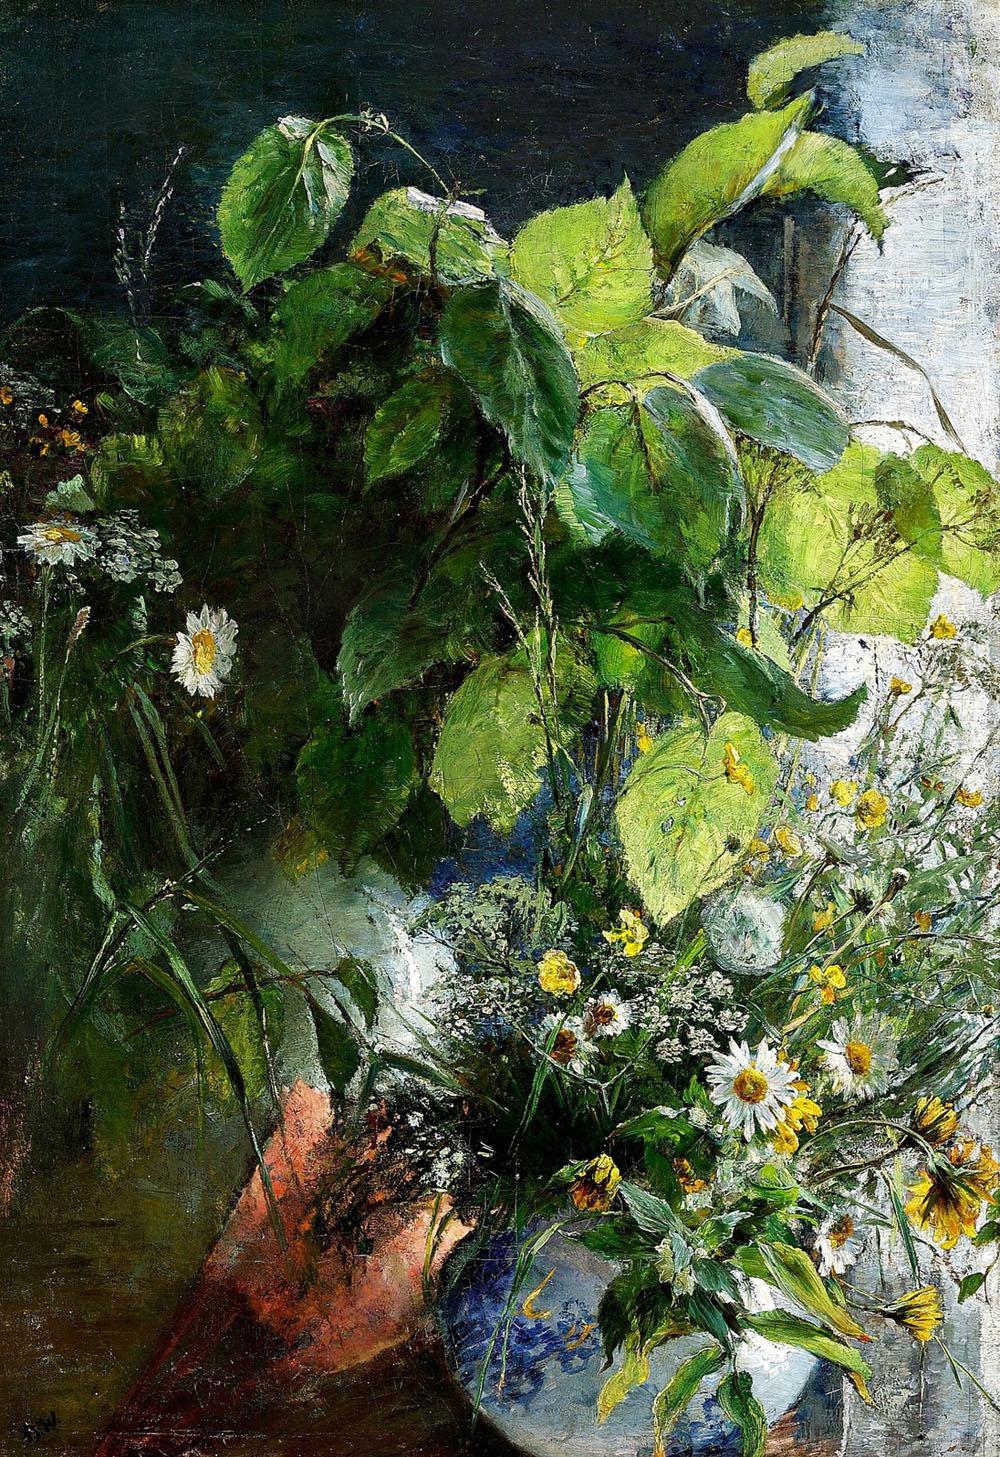 NATYRMORT-S-BUKOVYMI-VETVYMI-I-TVETAMI-V-VAZE-Still-life-with-beech-branches-and-flowers-in-a-vase_85-K-59_K.M._CASTNOE-SOBRANIE.jpg